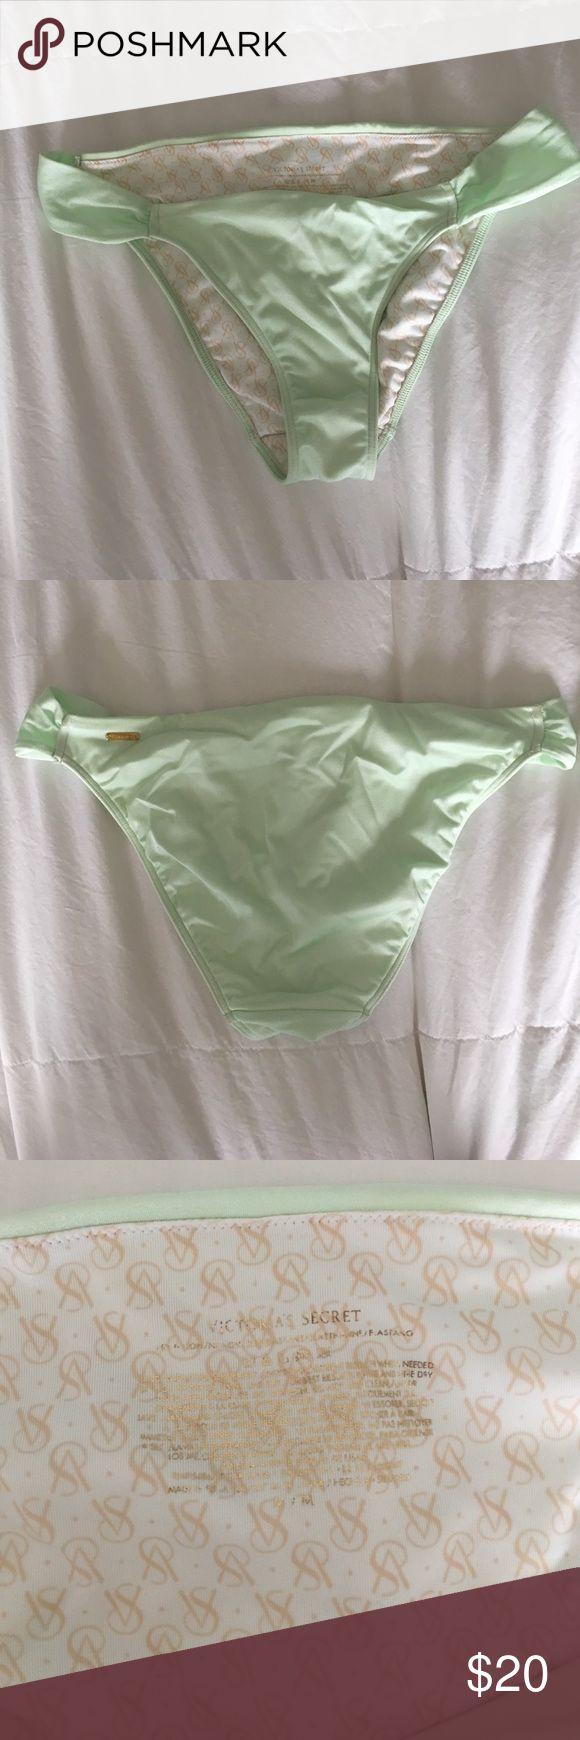 VS bikini bottoms VS (not PINK) foam green bikini bottoms, medium coverage, size M, worn twice PINK Victoria's Secret Swim